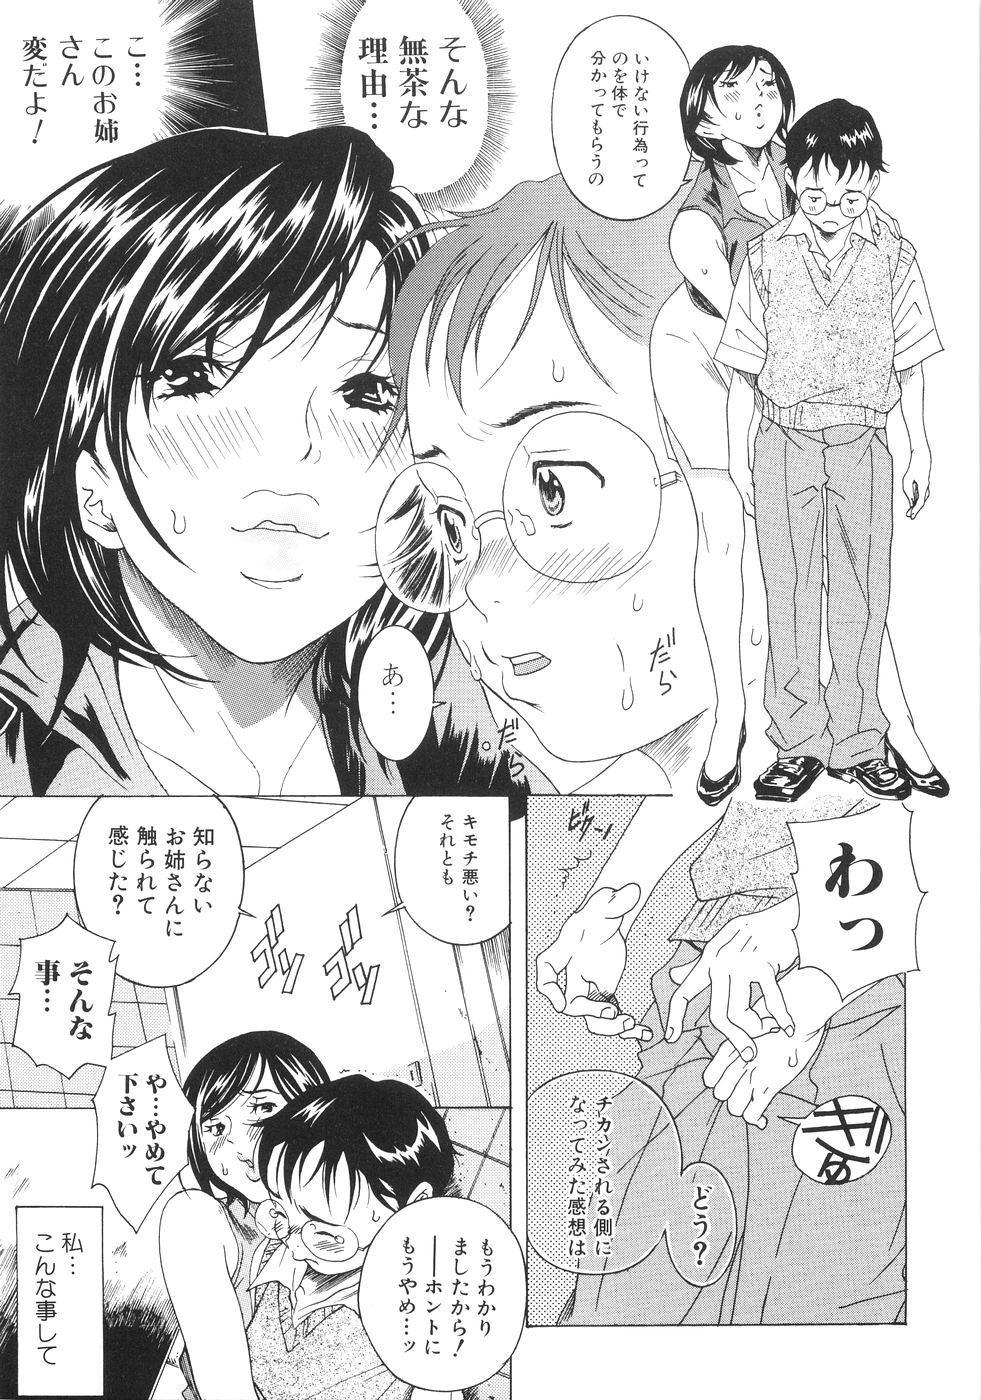 Honki Jiru - Cowper's Gland Liquid? or Love Juice?...?! 57